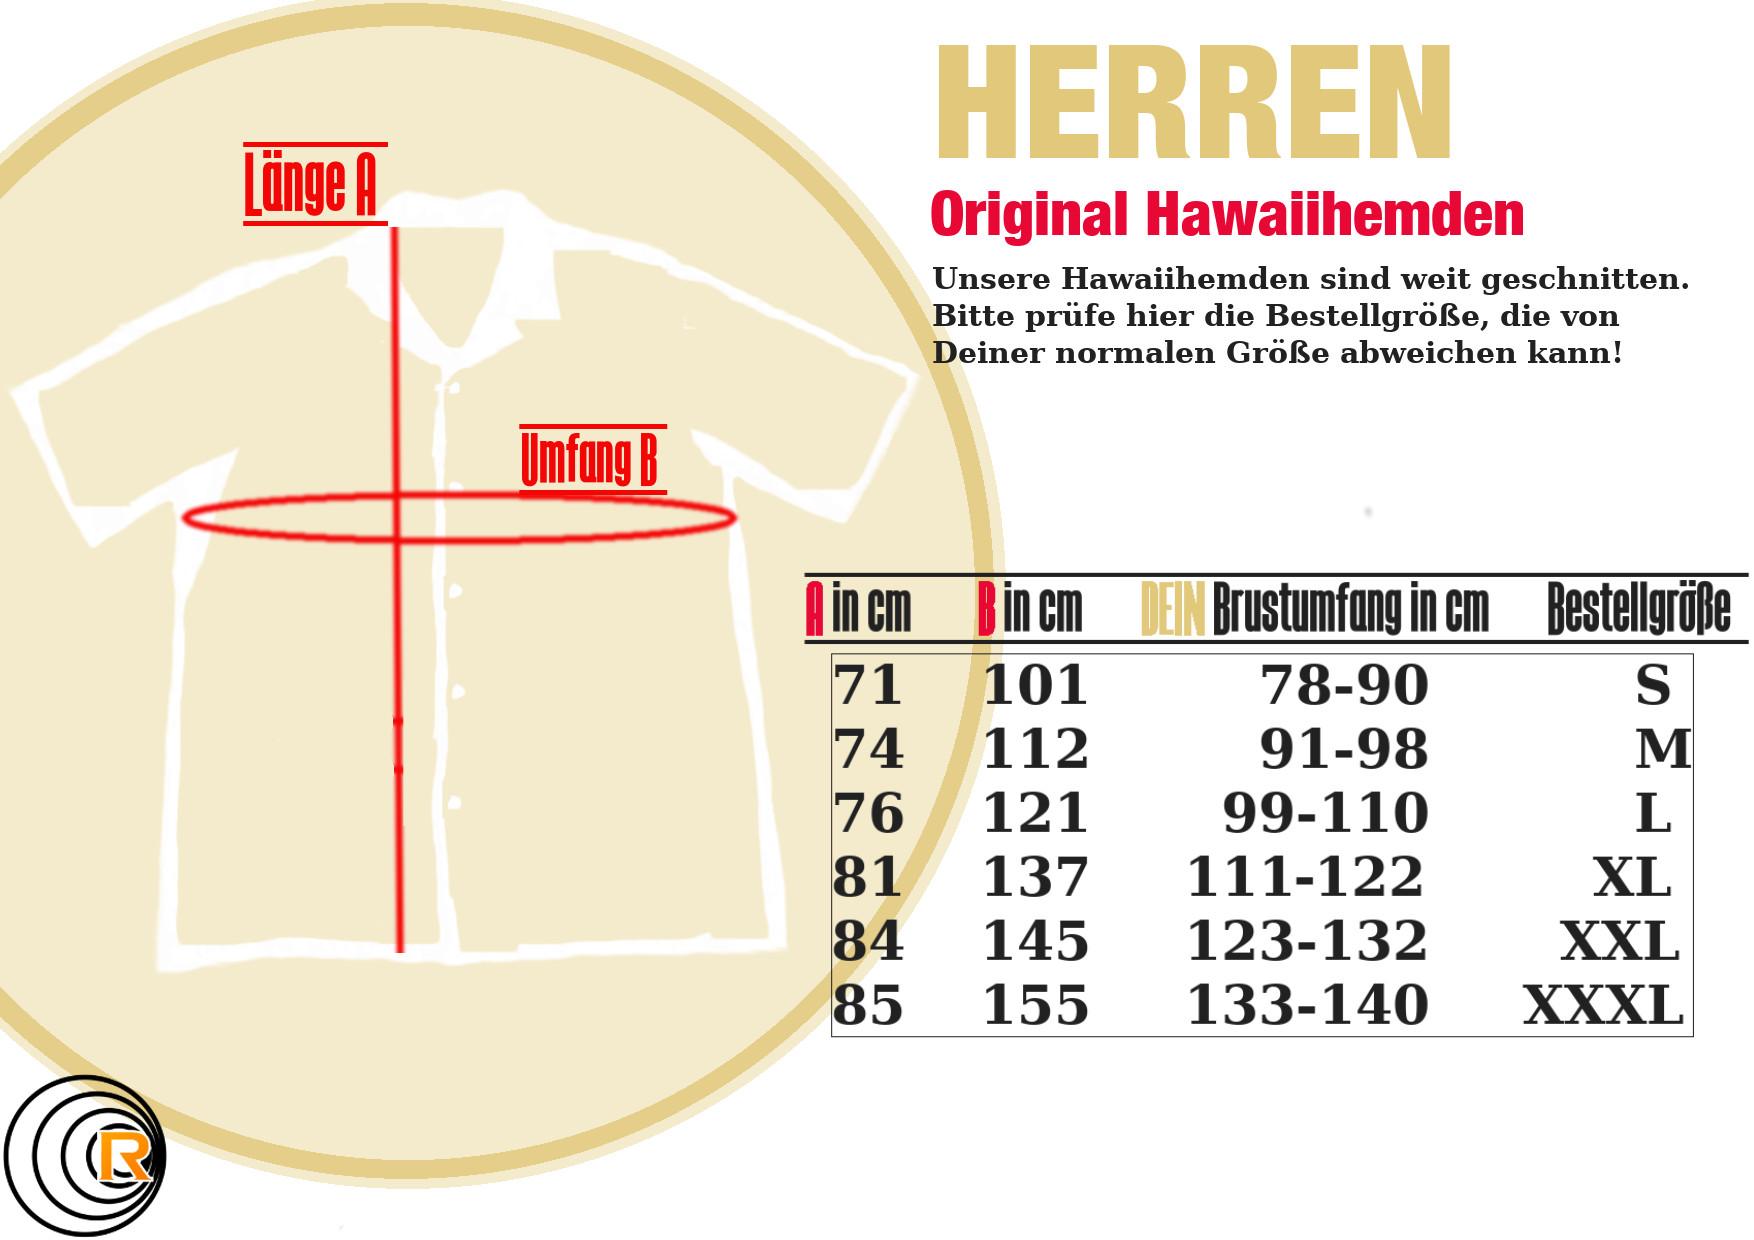 Original Hawaiihemd -The Hedge-